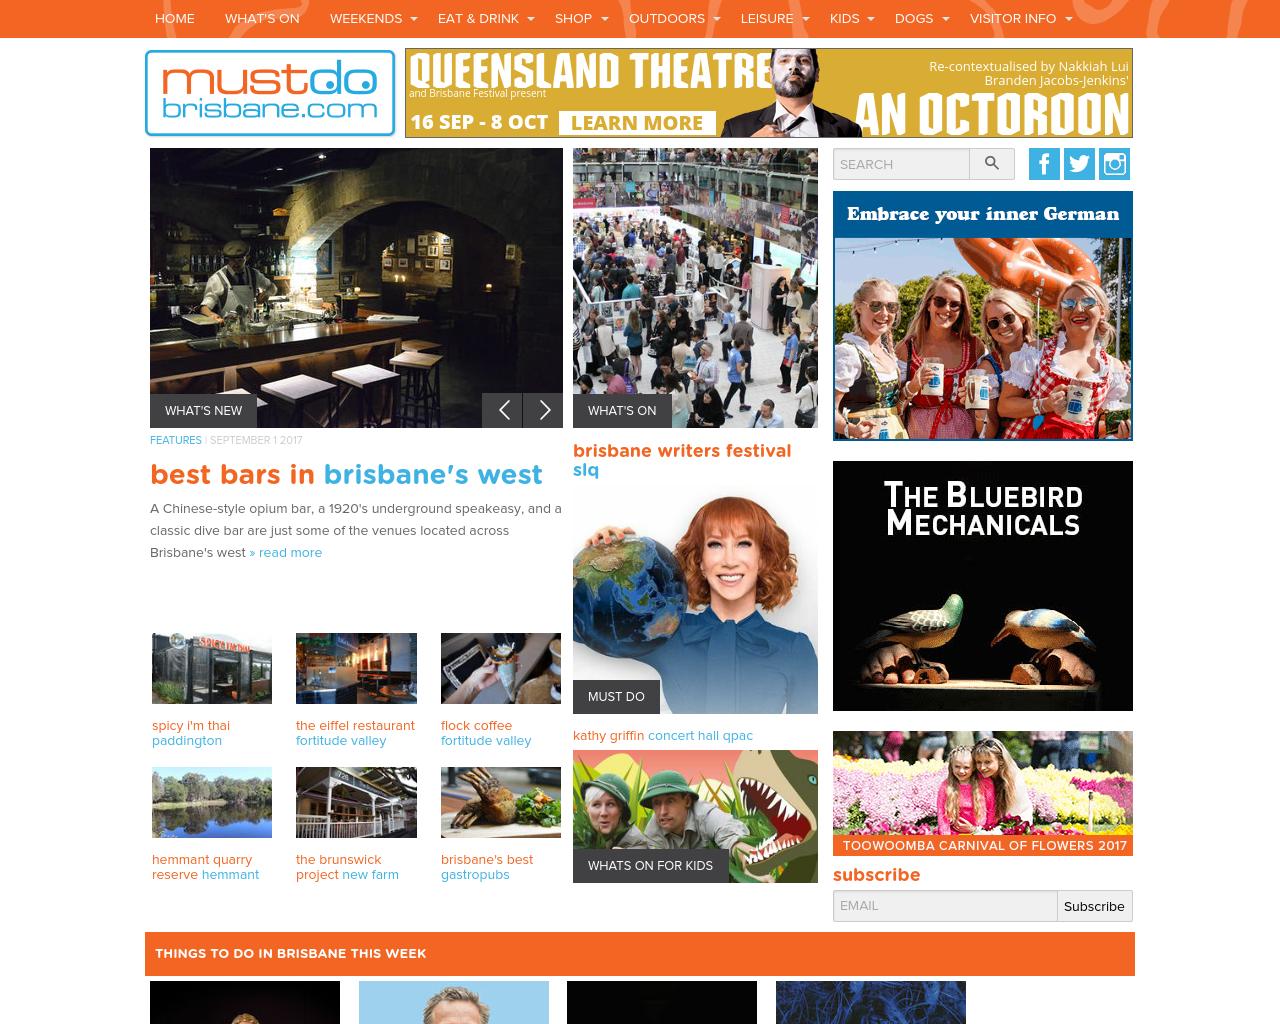 Mustdobrisbane.com-Advertising-Reviews-Pricing